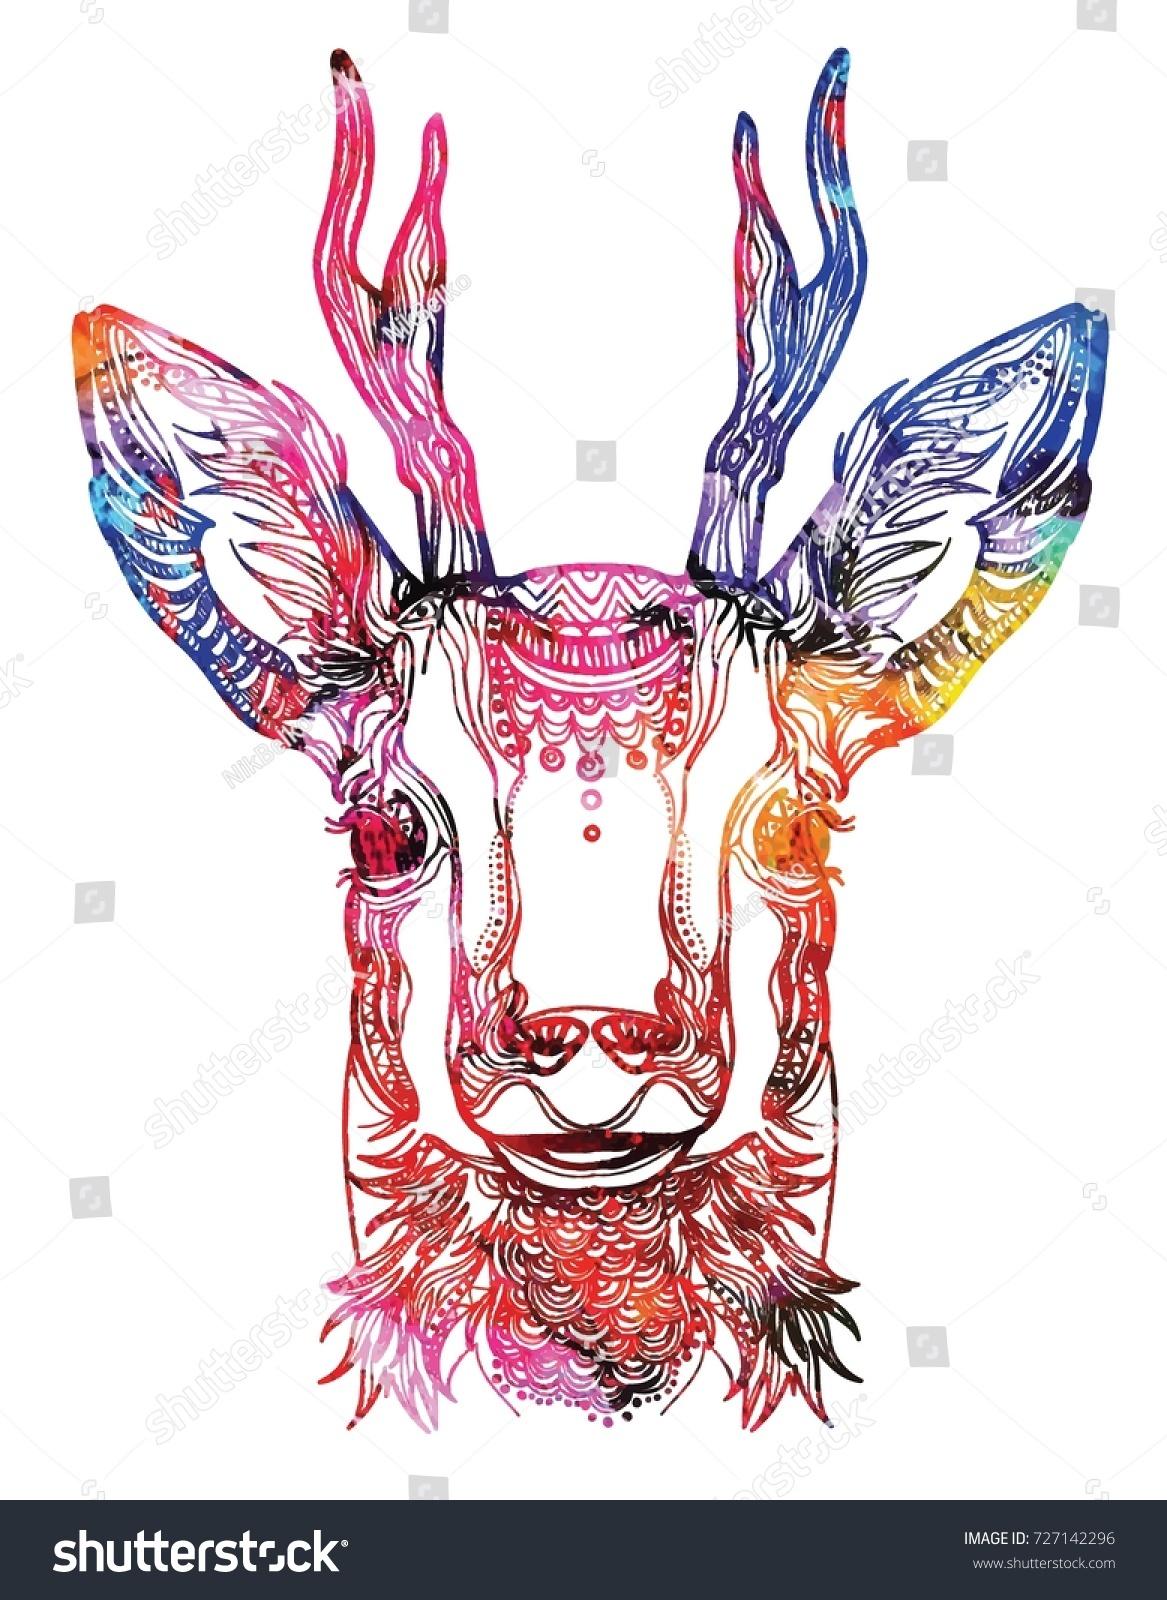 Meditation Coloring Of The Mandala Head A Deer